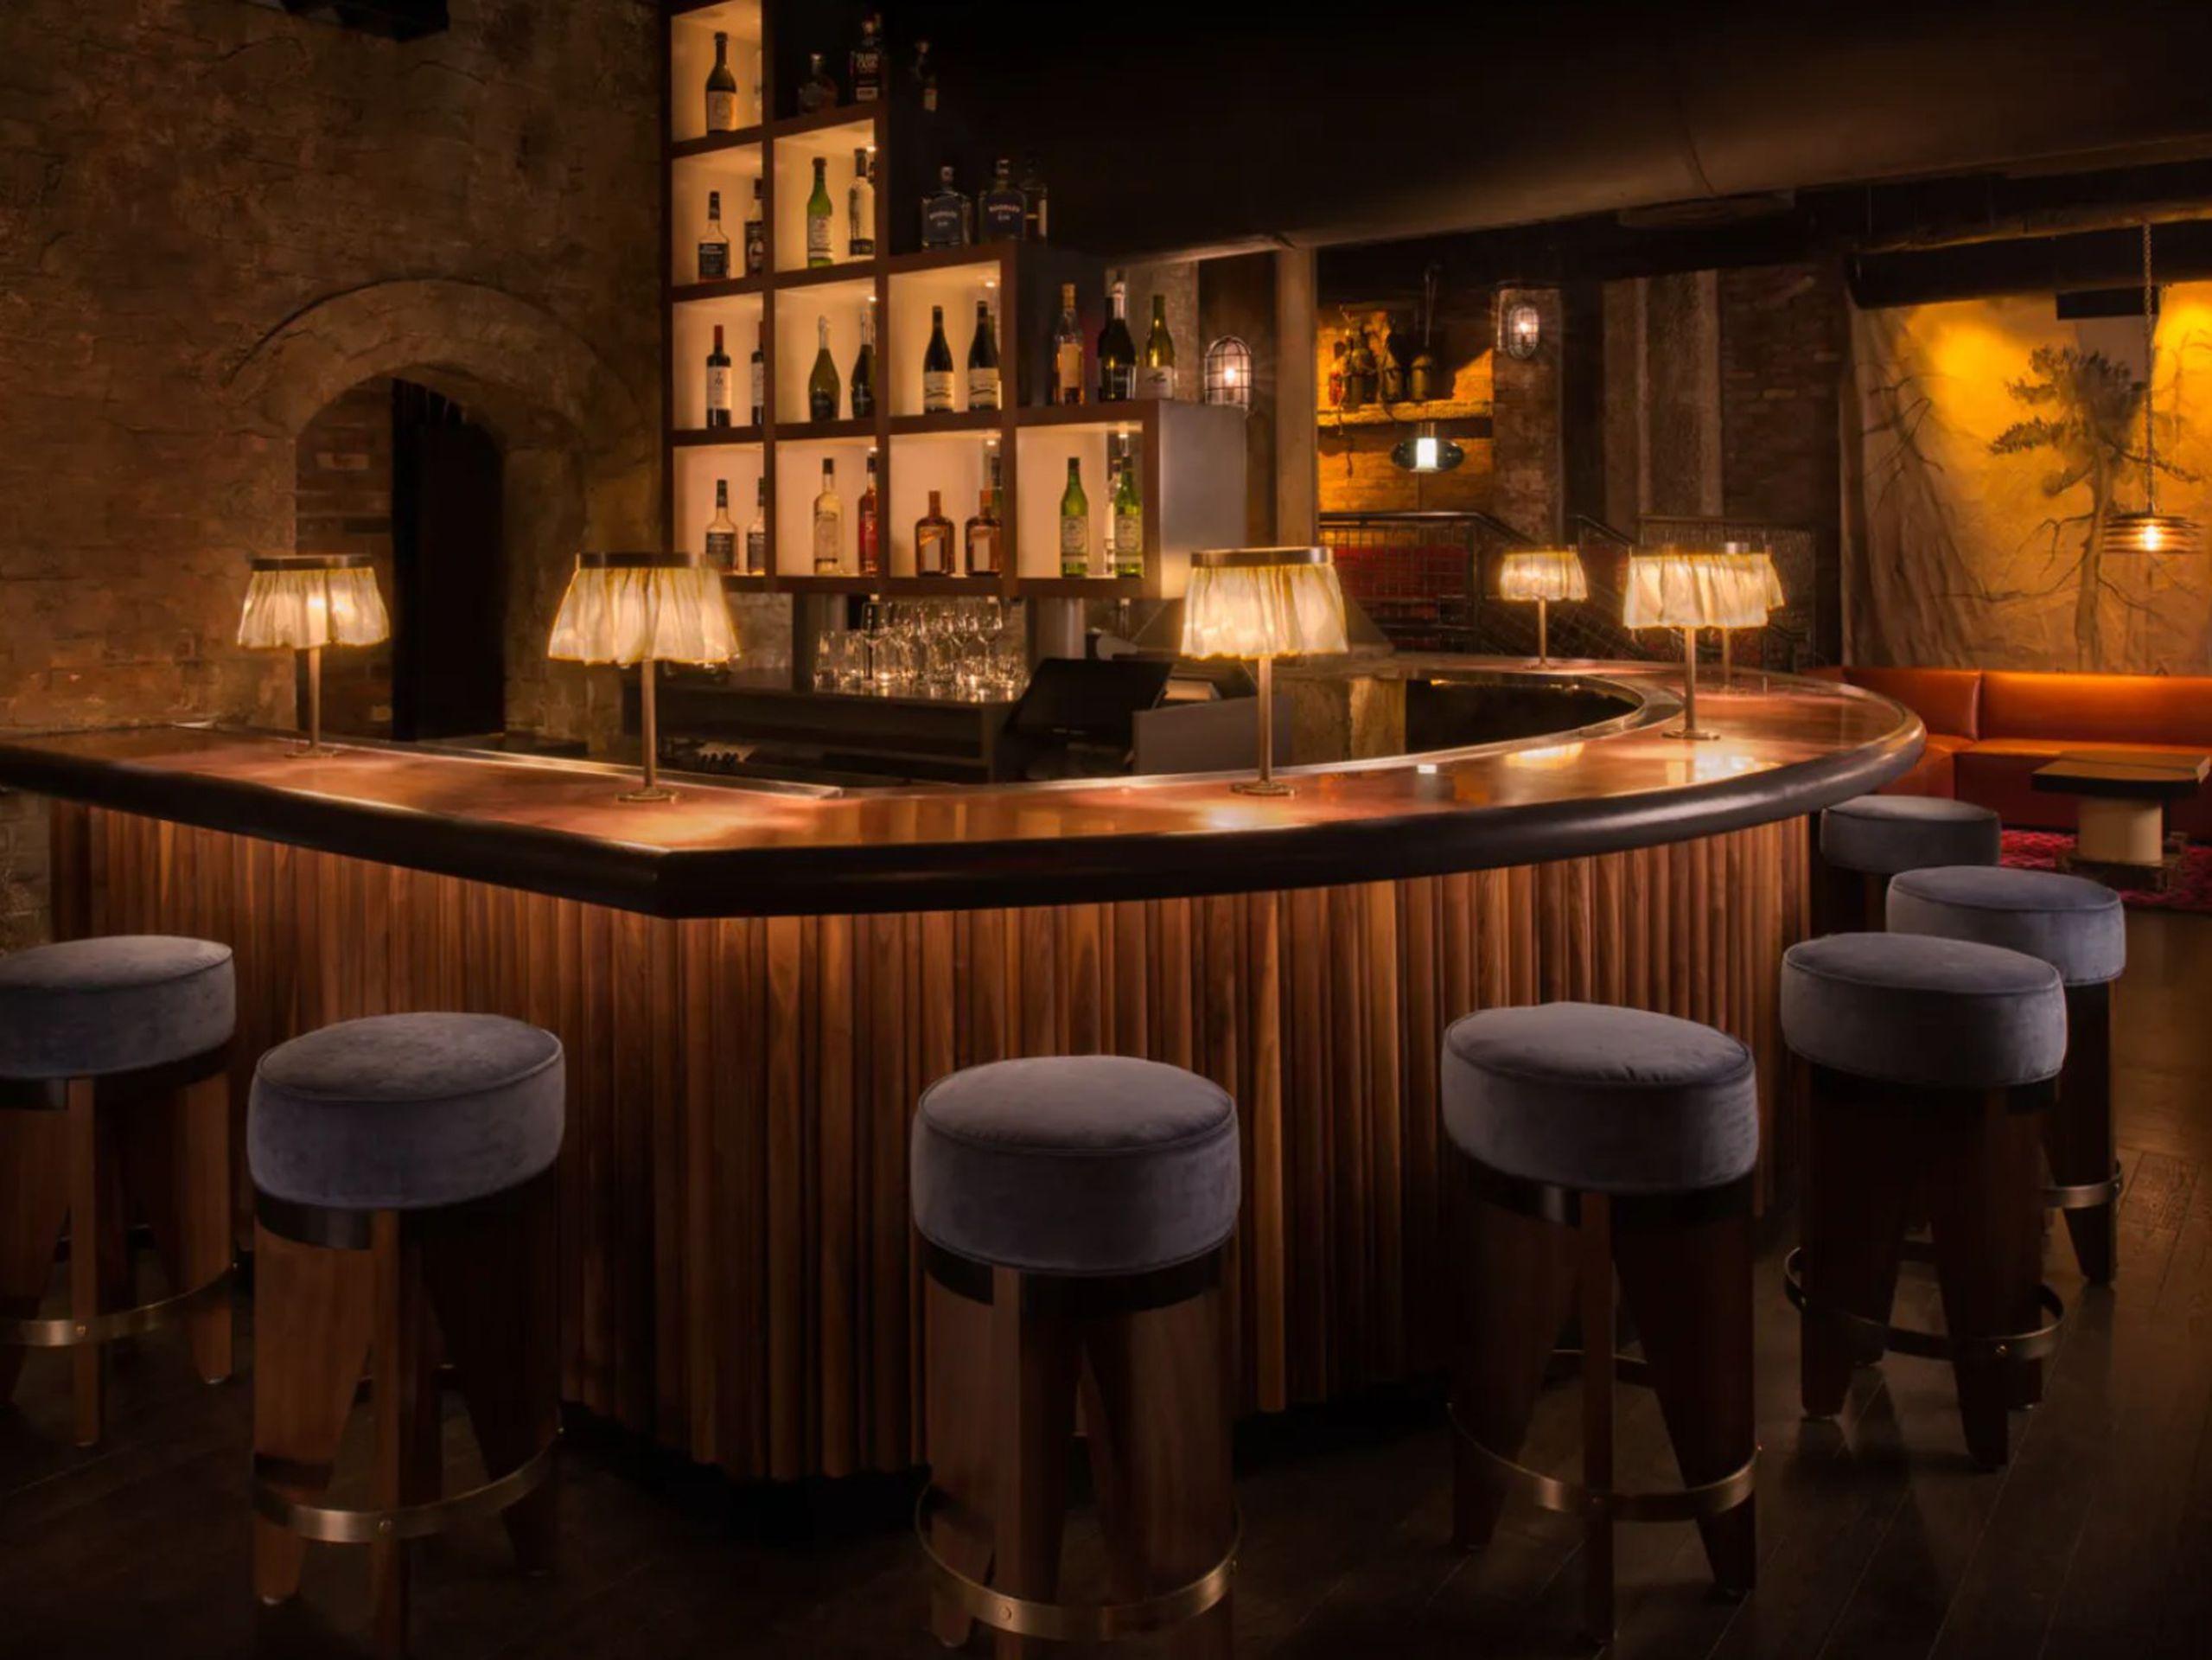 Curved sleek bar with blue velvet bar stools